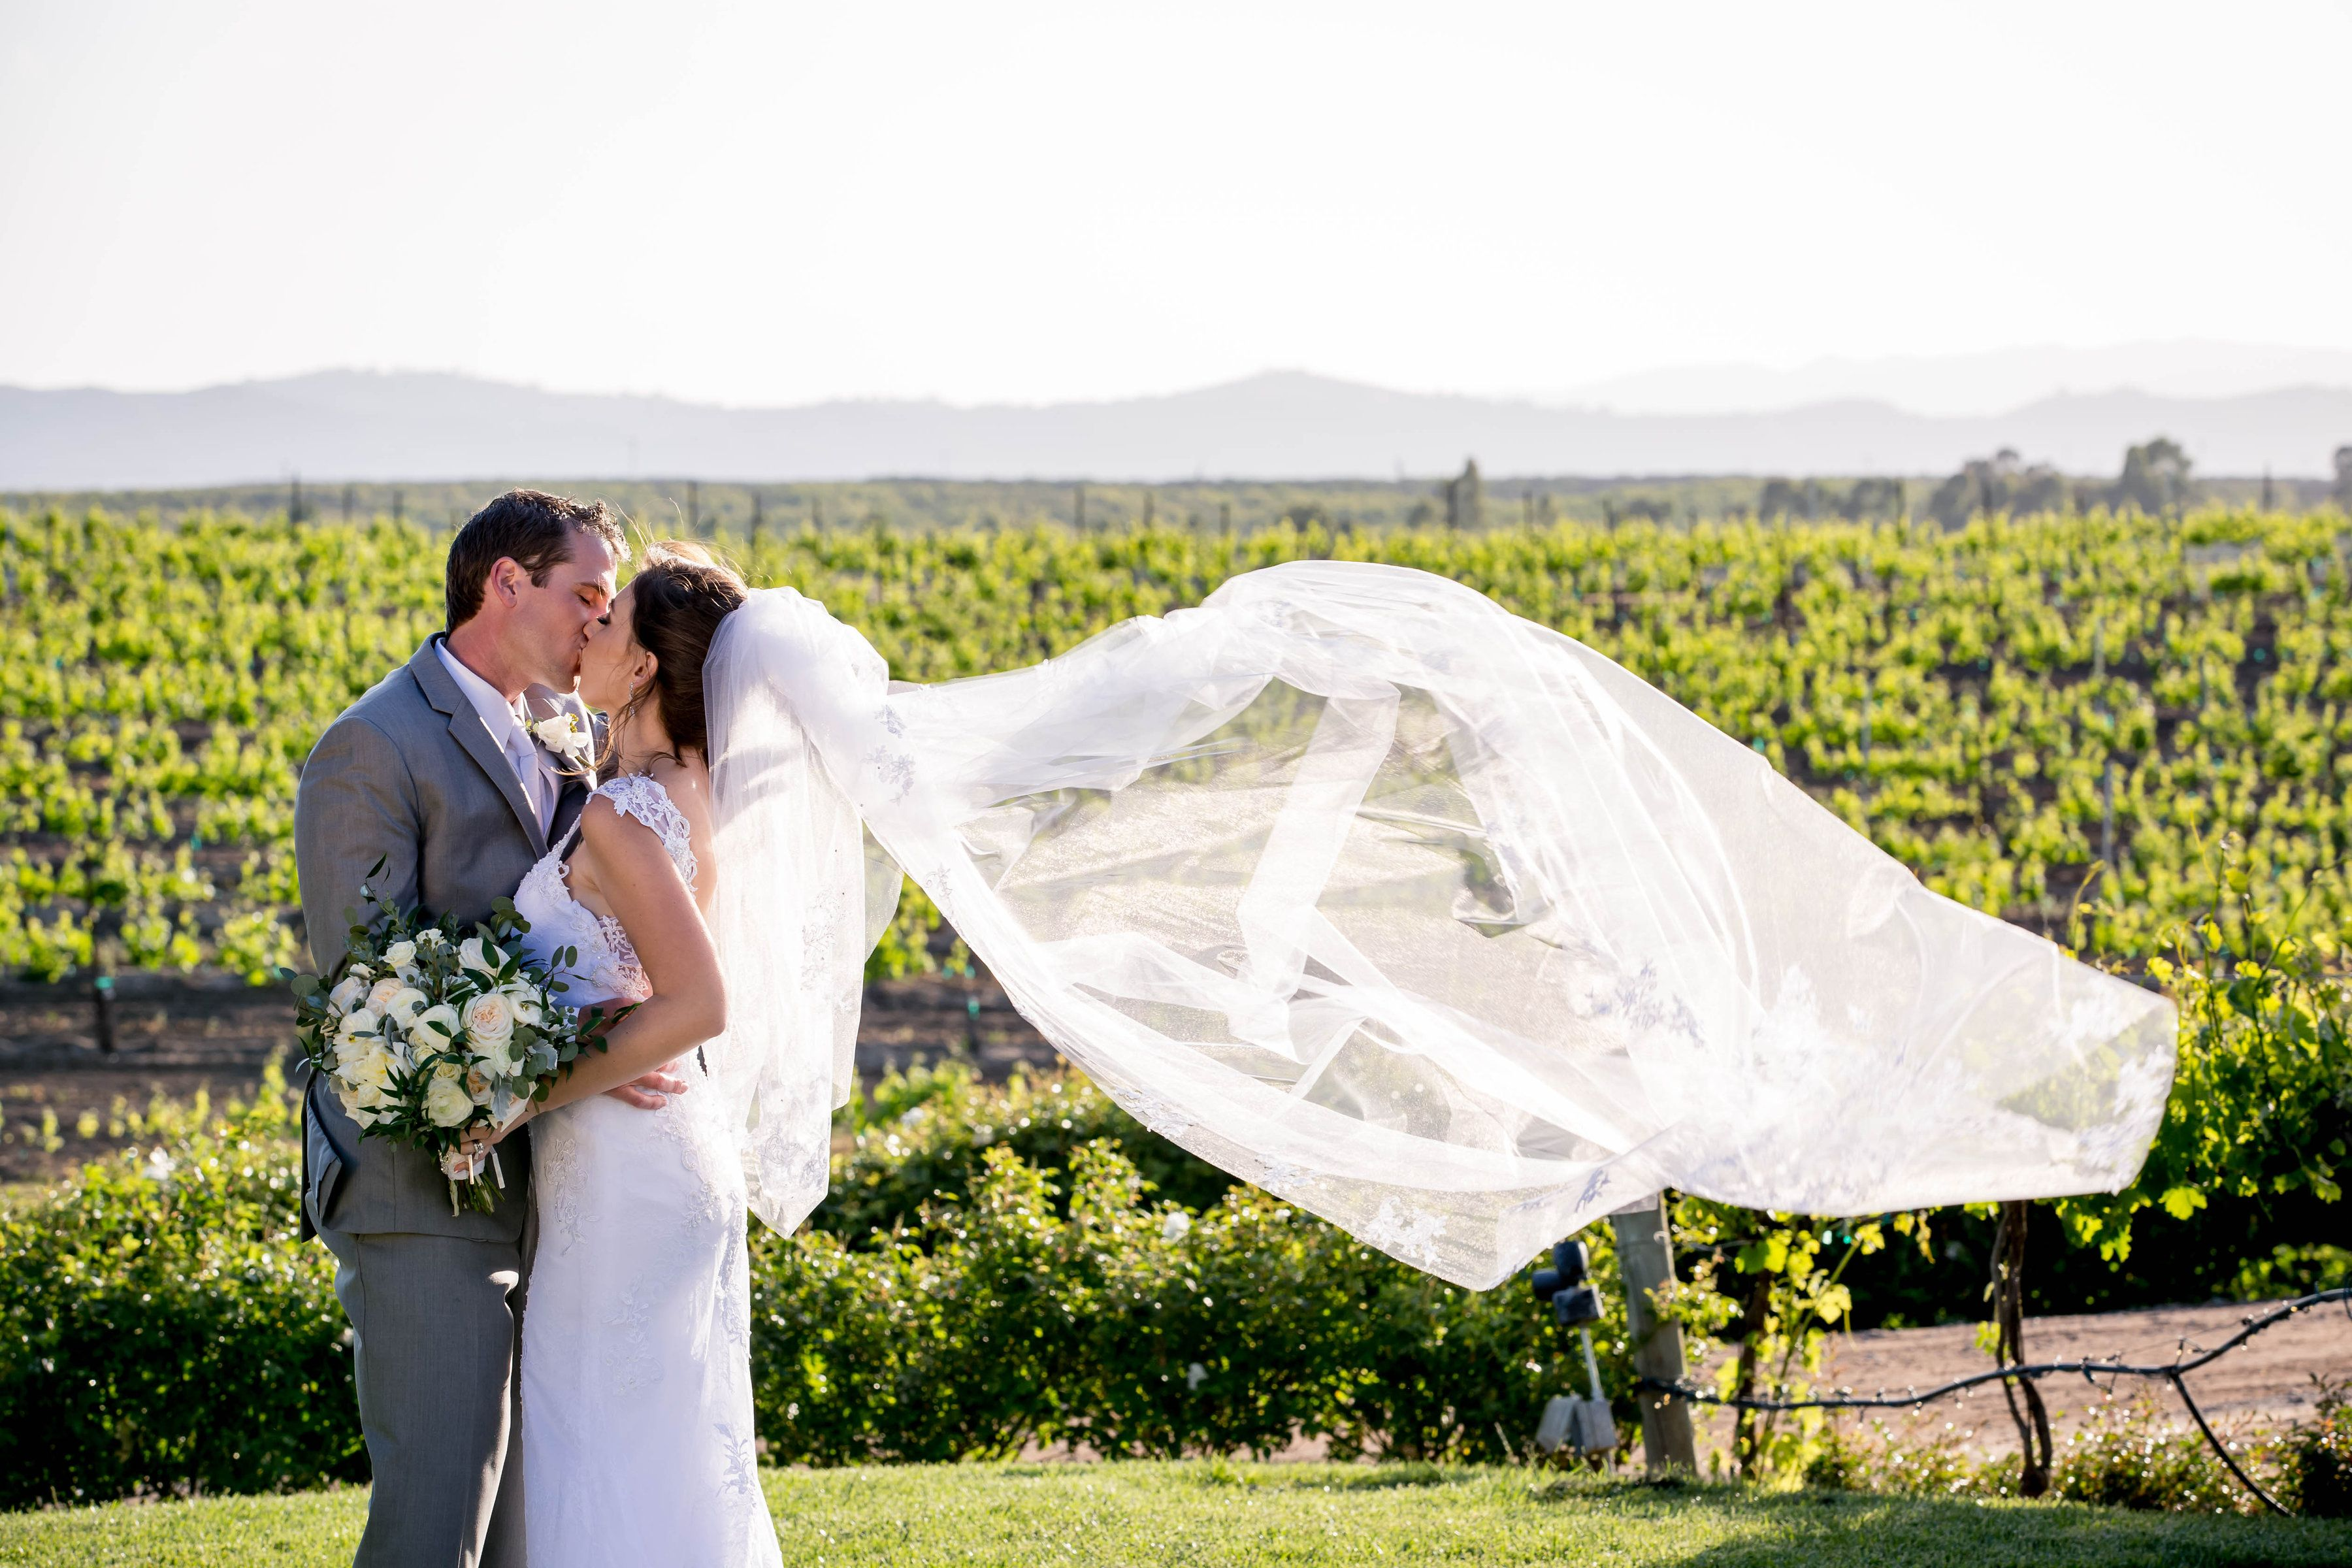 Pin by Villa de Amore California Wedd on Temecula Weddings